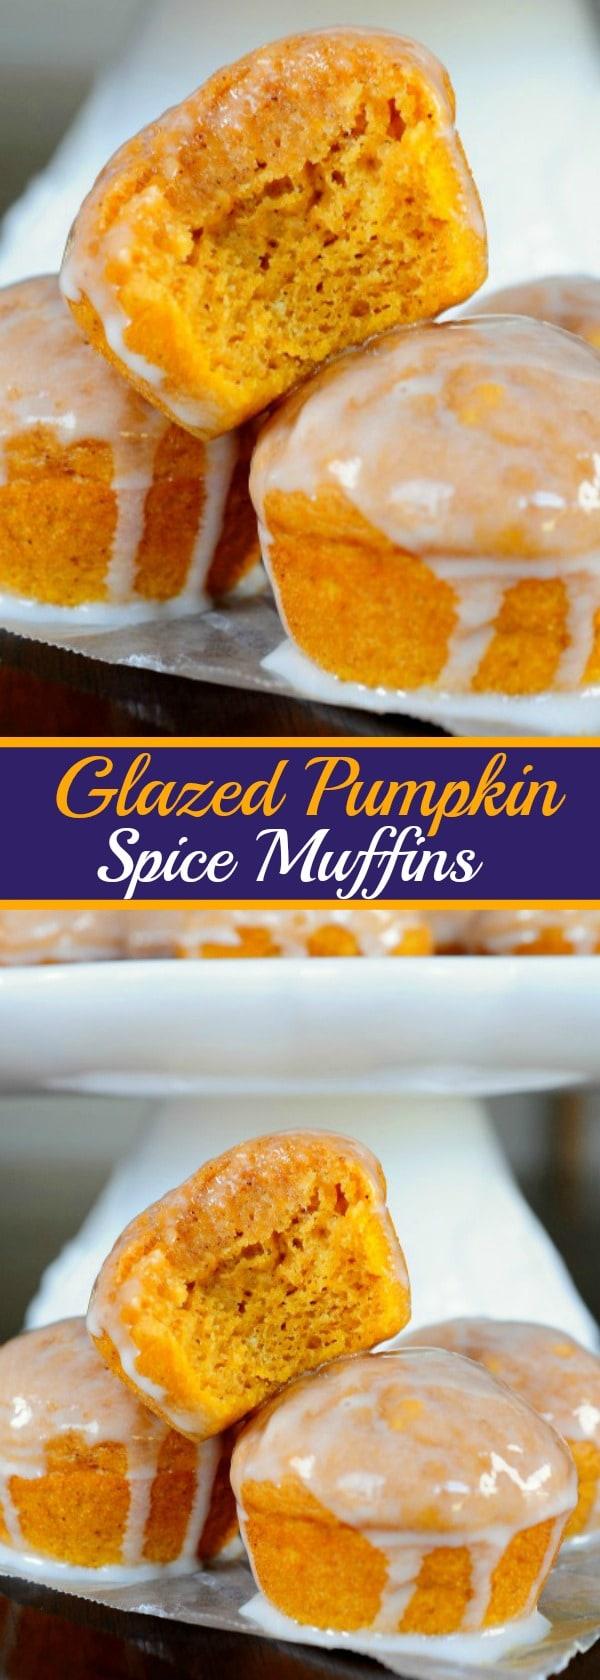 Glazed Pumpkin Spice Muffins - Perfect cozy, fall breakfast!